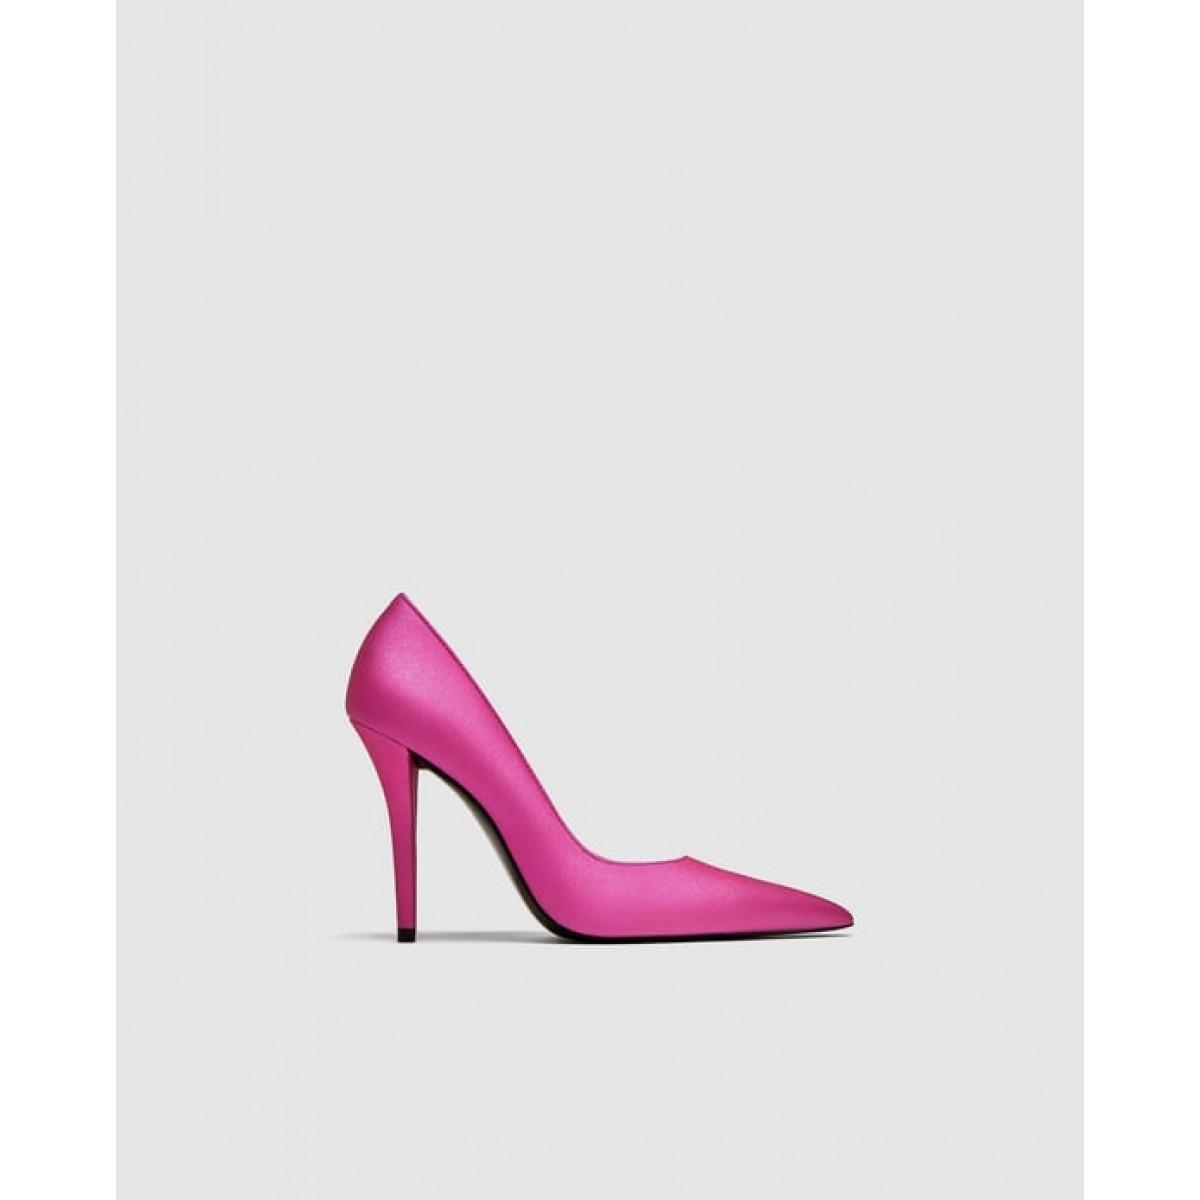 Zara Fuchsia High Heel Court Shoes